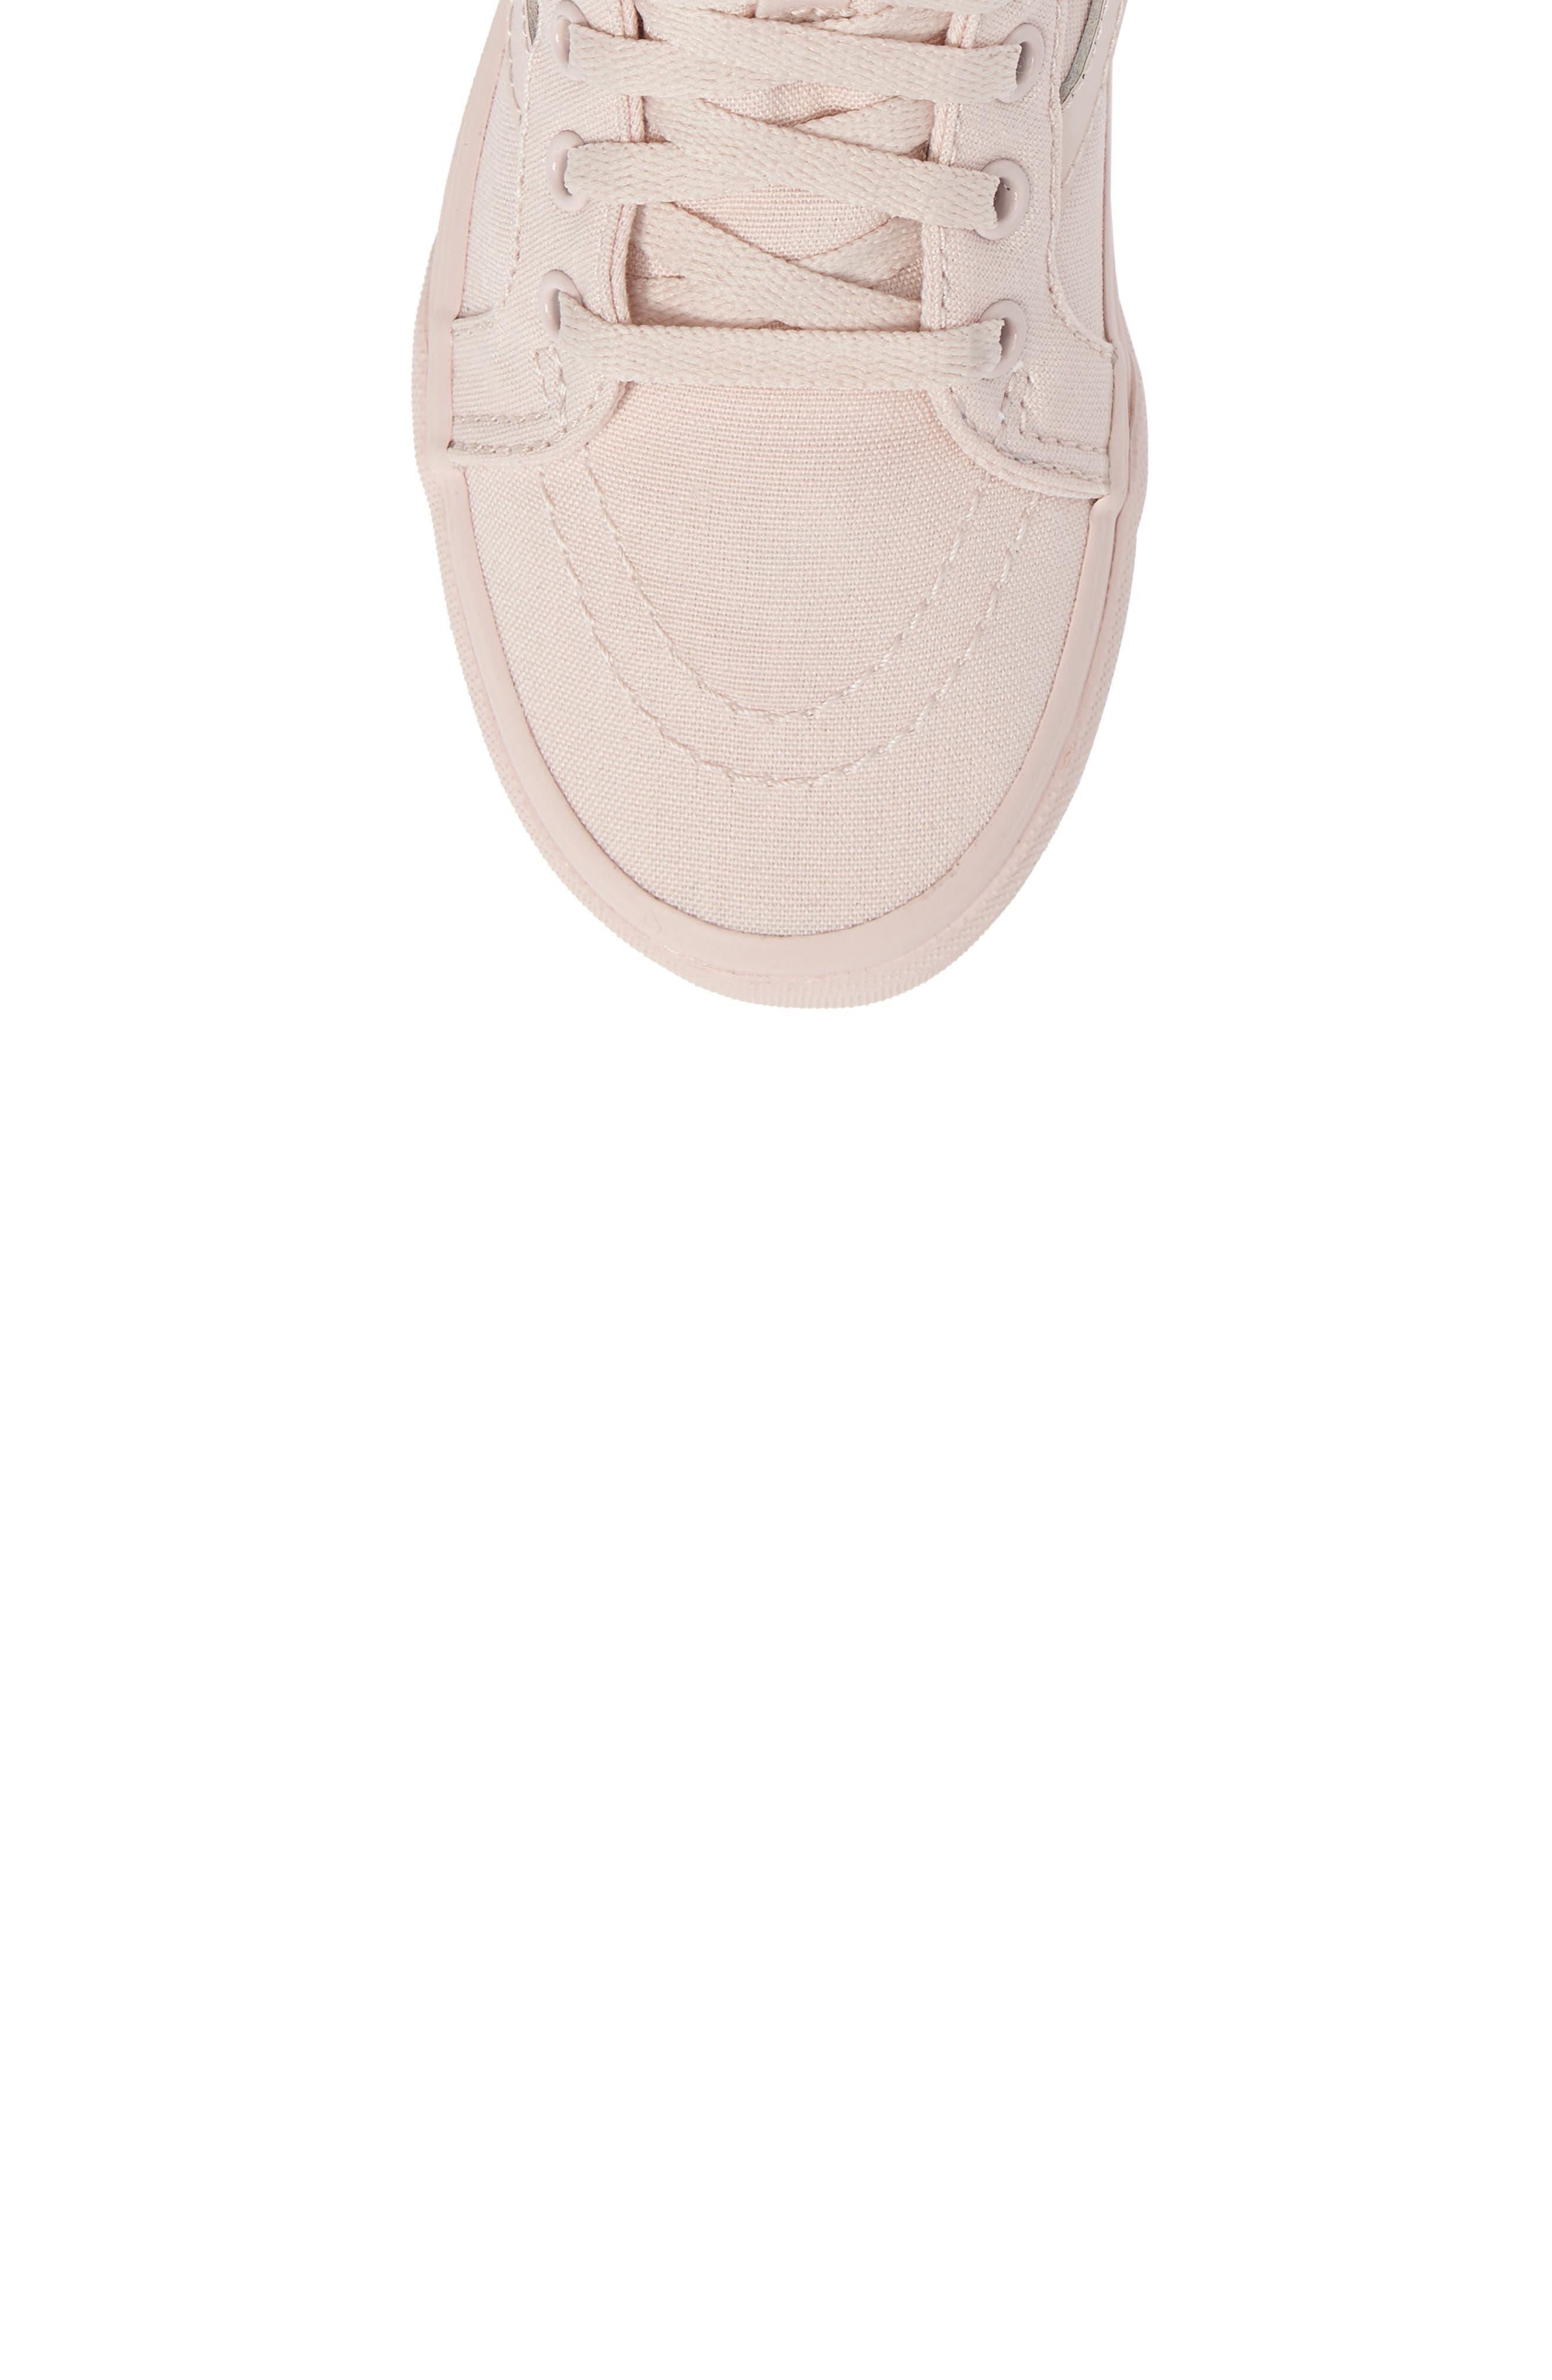 SK8-Hi Zip Sneaker,                             Alternate thumbnail 5, color,                             Peach Blush Canvas